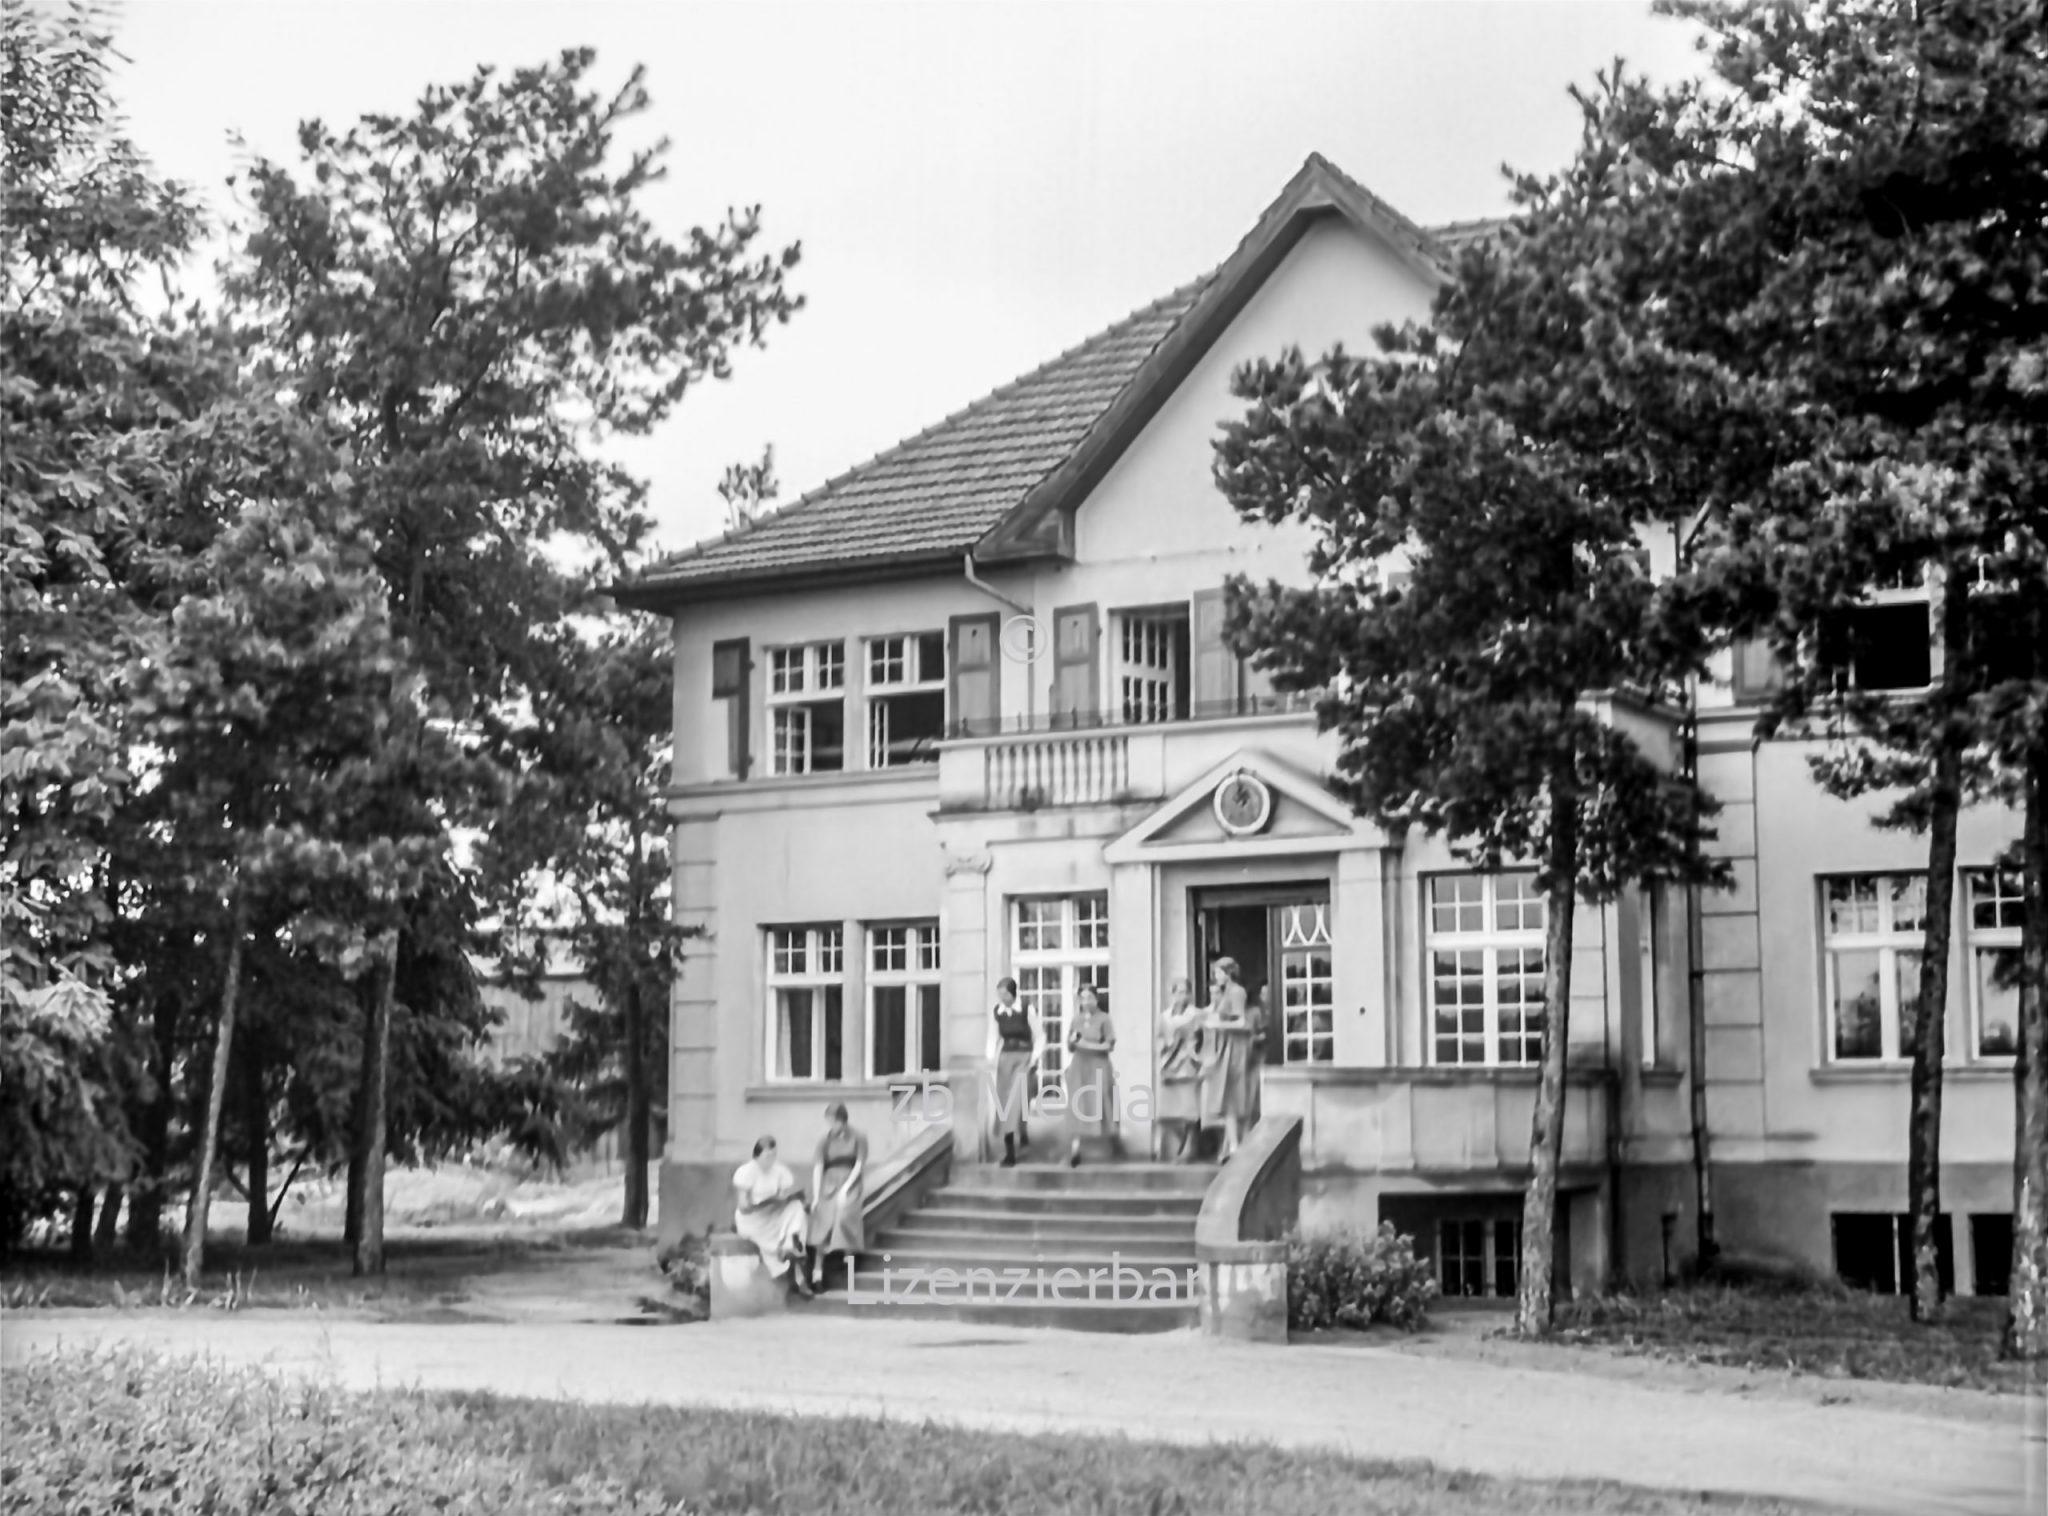 Pestalozzi-Fröbel-Haus Berlin 1937